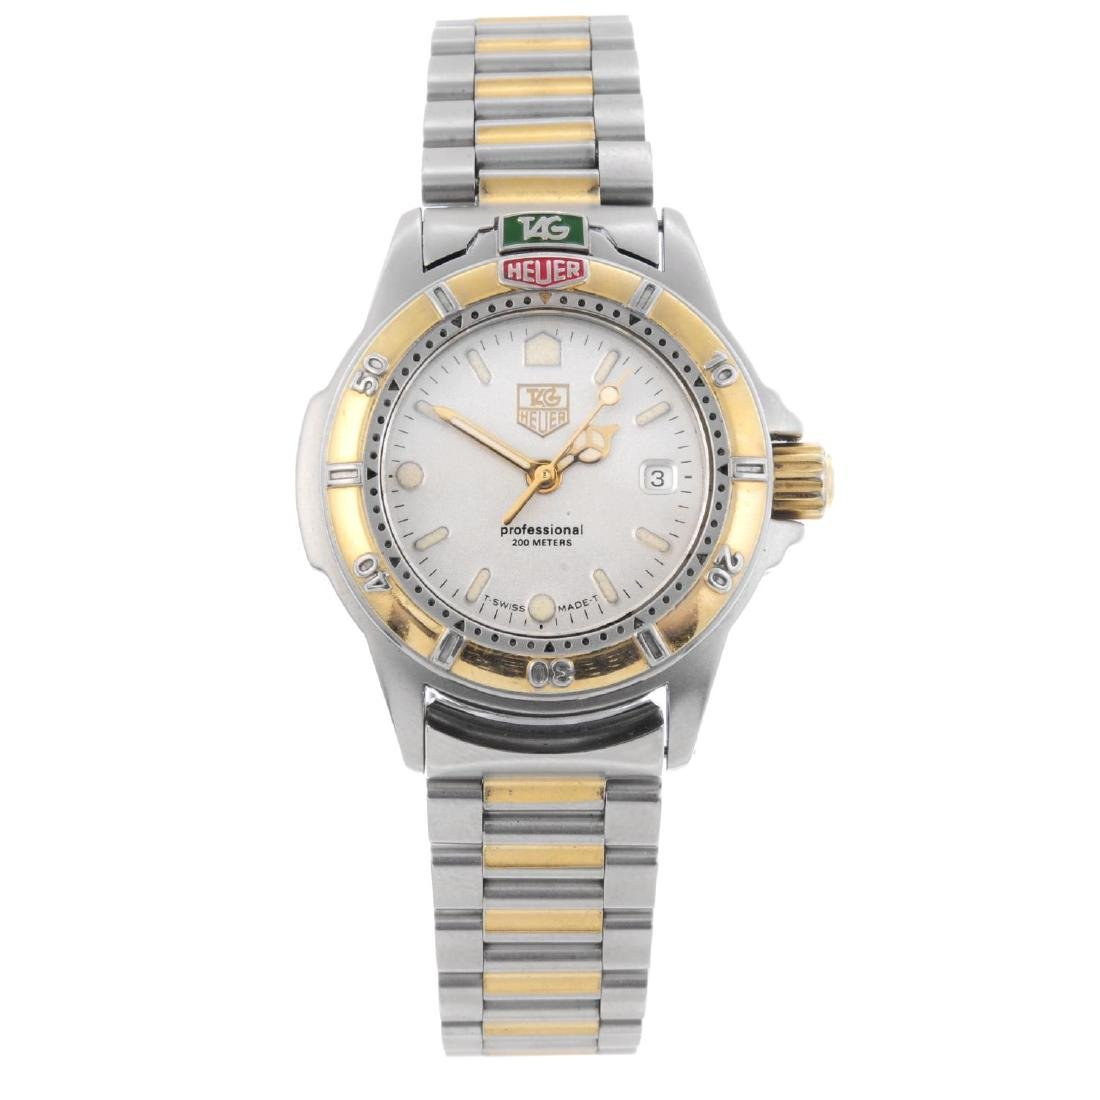 TAG HEUER - a lady's 4000 Series bracelet watch.